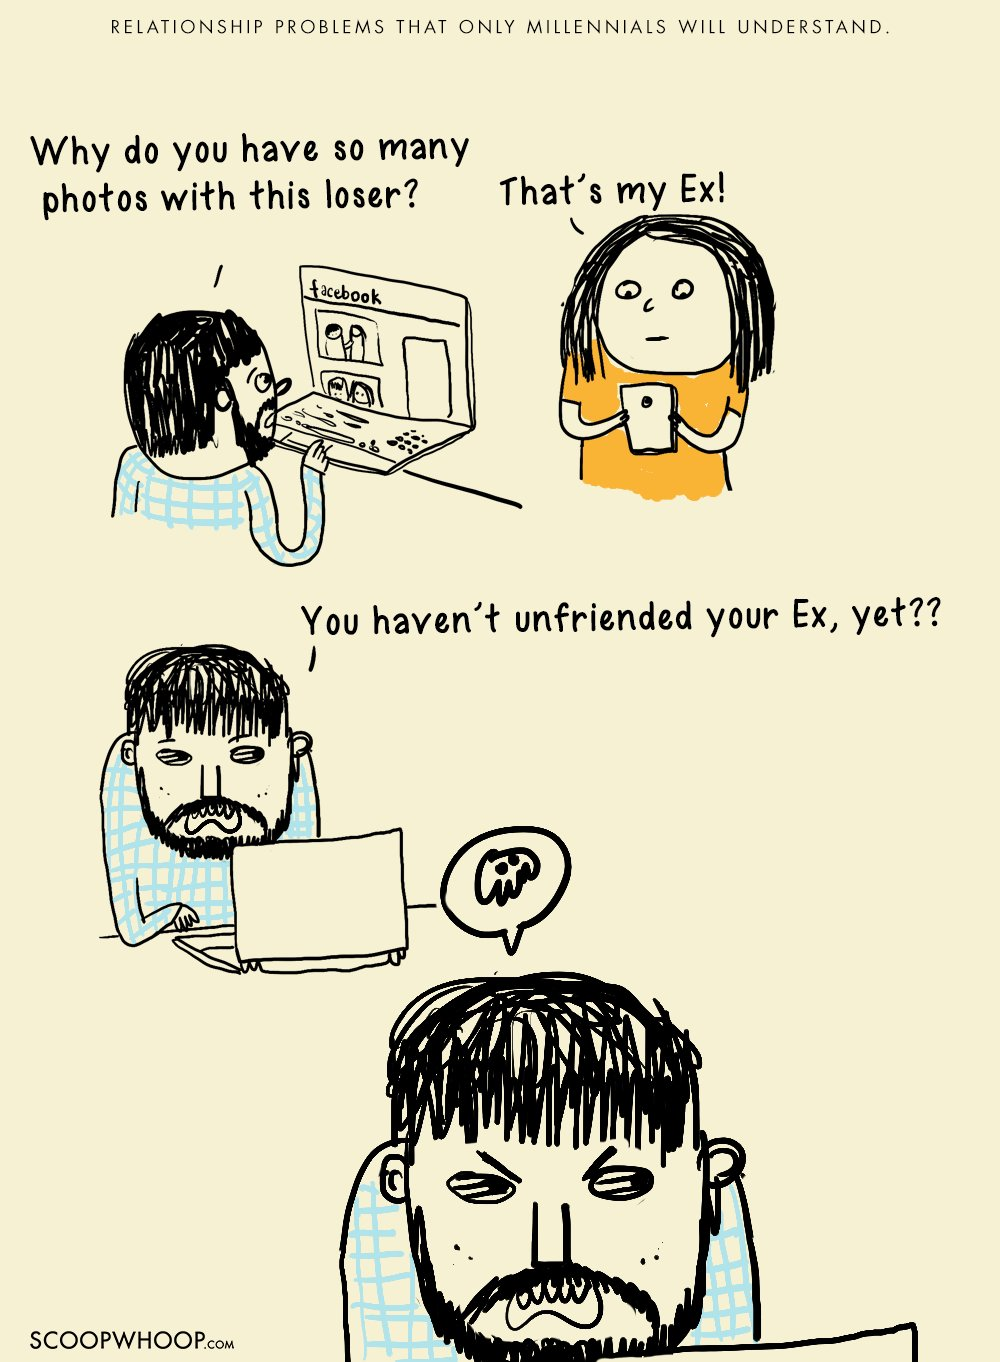 14 Komik Lucu Tentang Masalah Percintaan Yang Hanya Dipahami